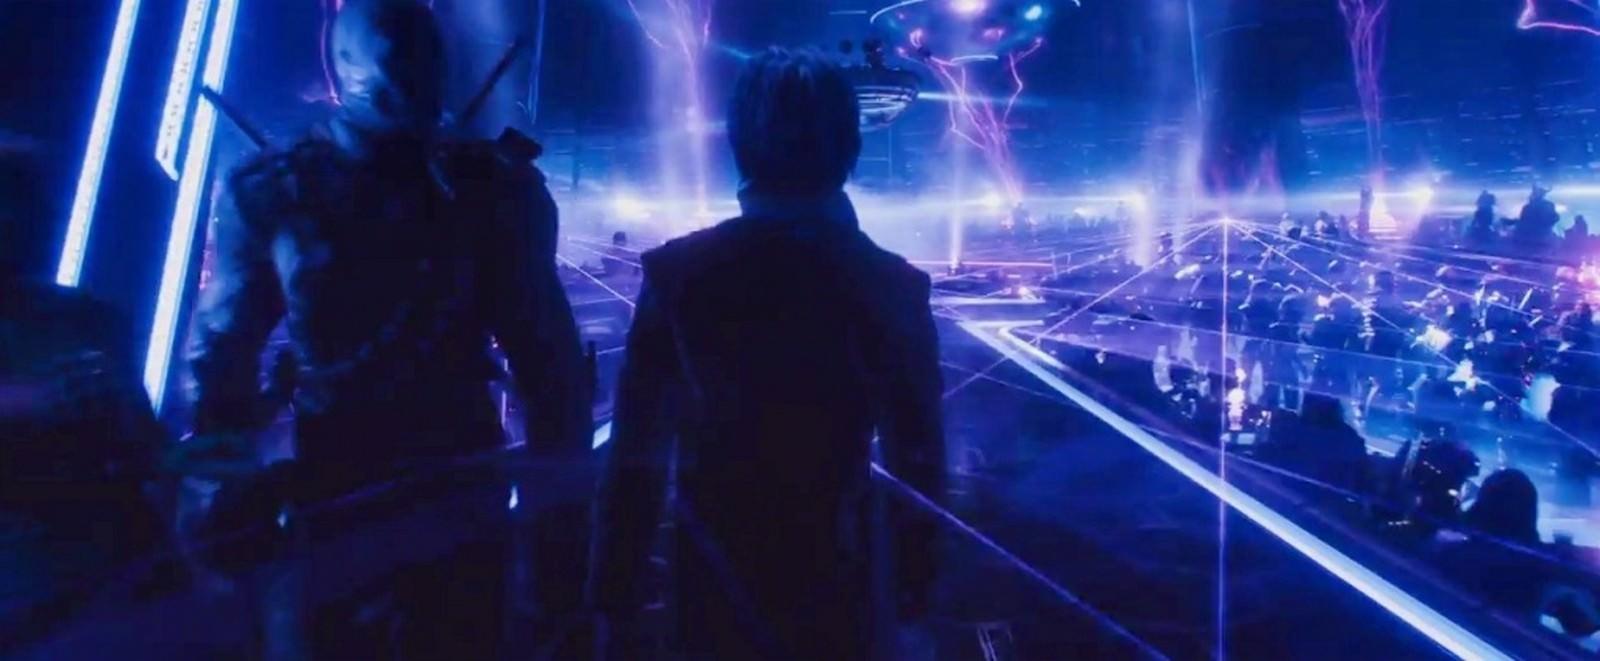 Movie, Ready Player One(美國) / 一級玩家(台) / 头号玩家(中) / 挑戰者1號(港), 電影劇照, 彩蛋整理